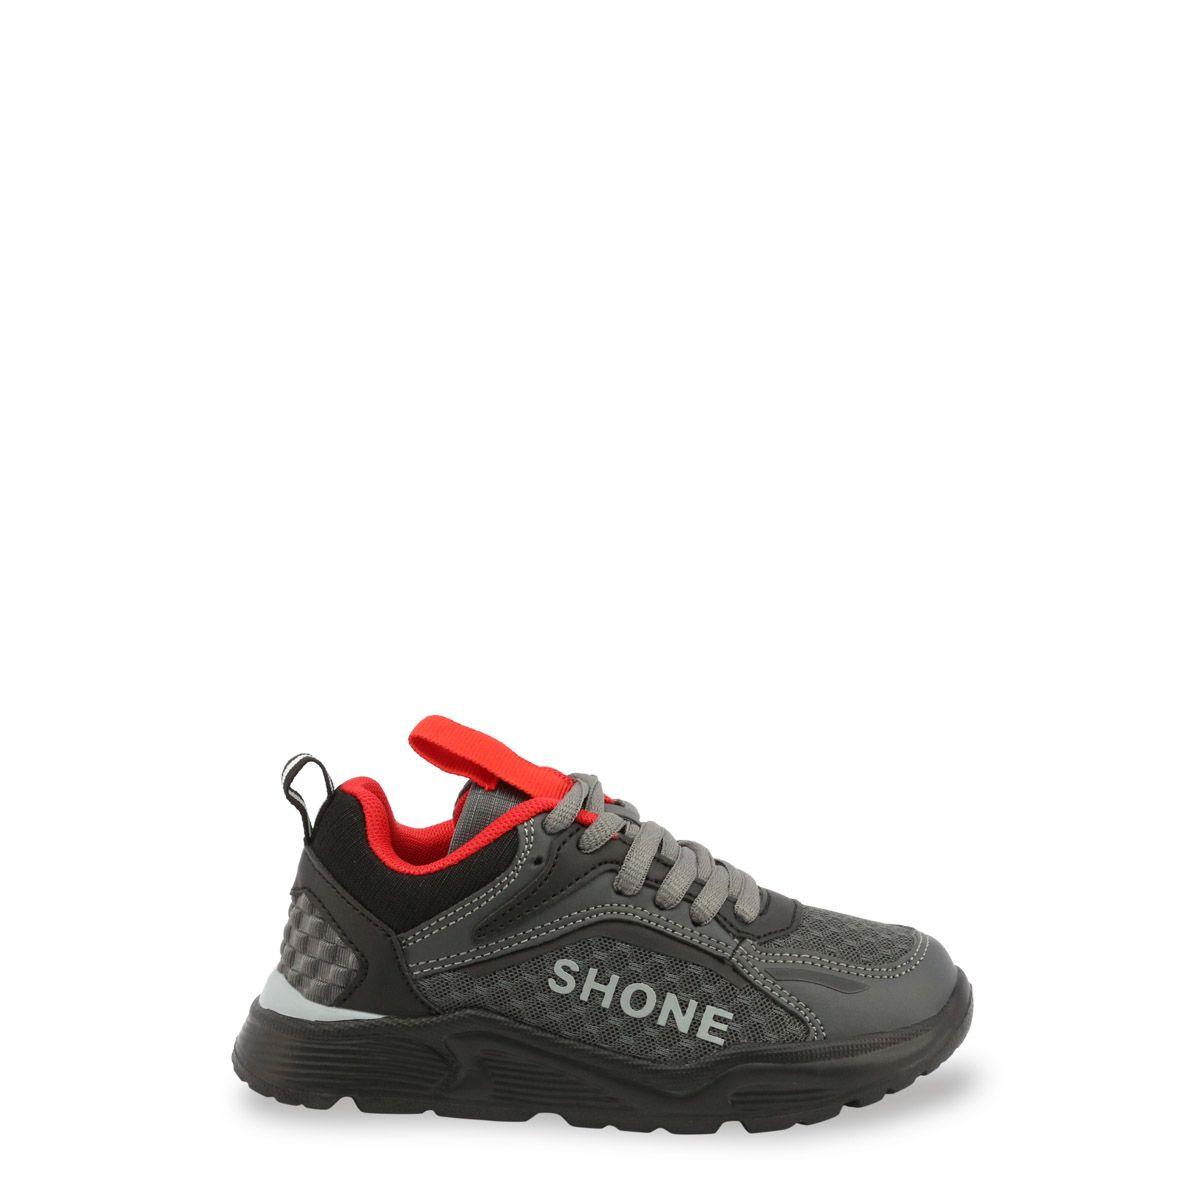 Shone - 903-001   You Fashion Outlet